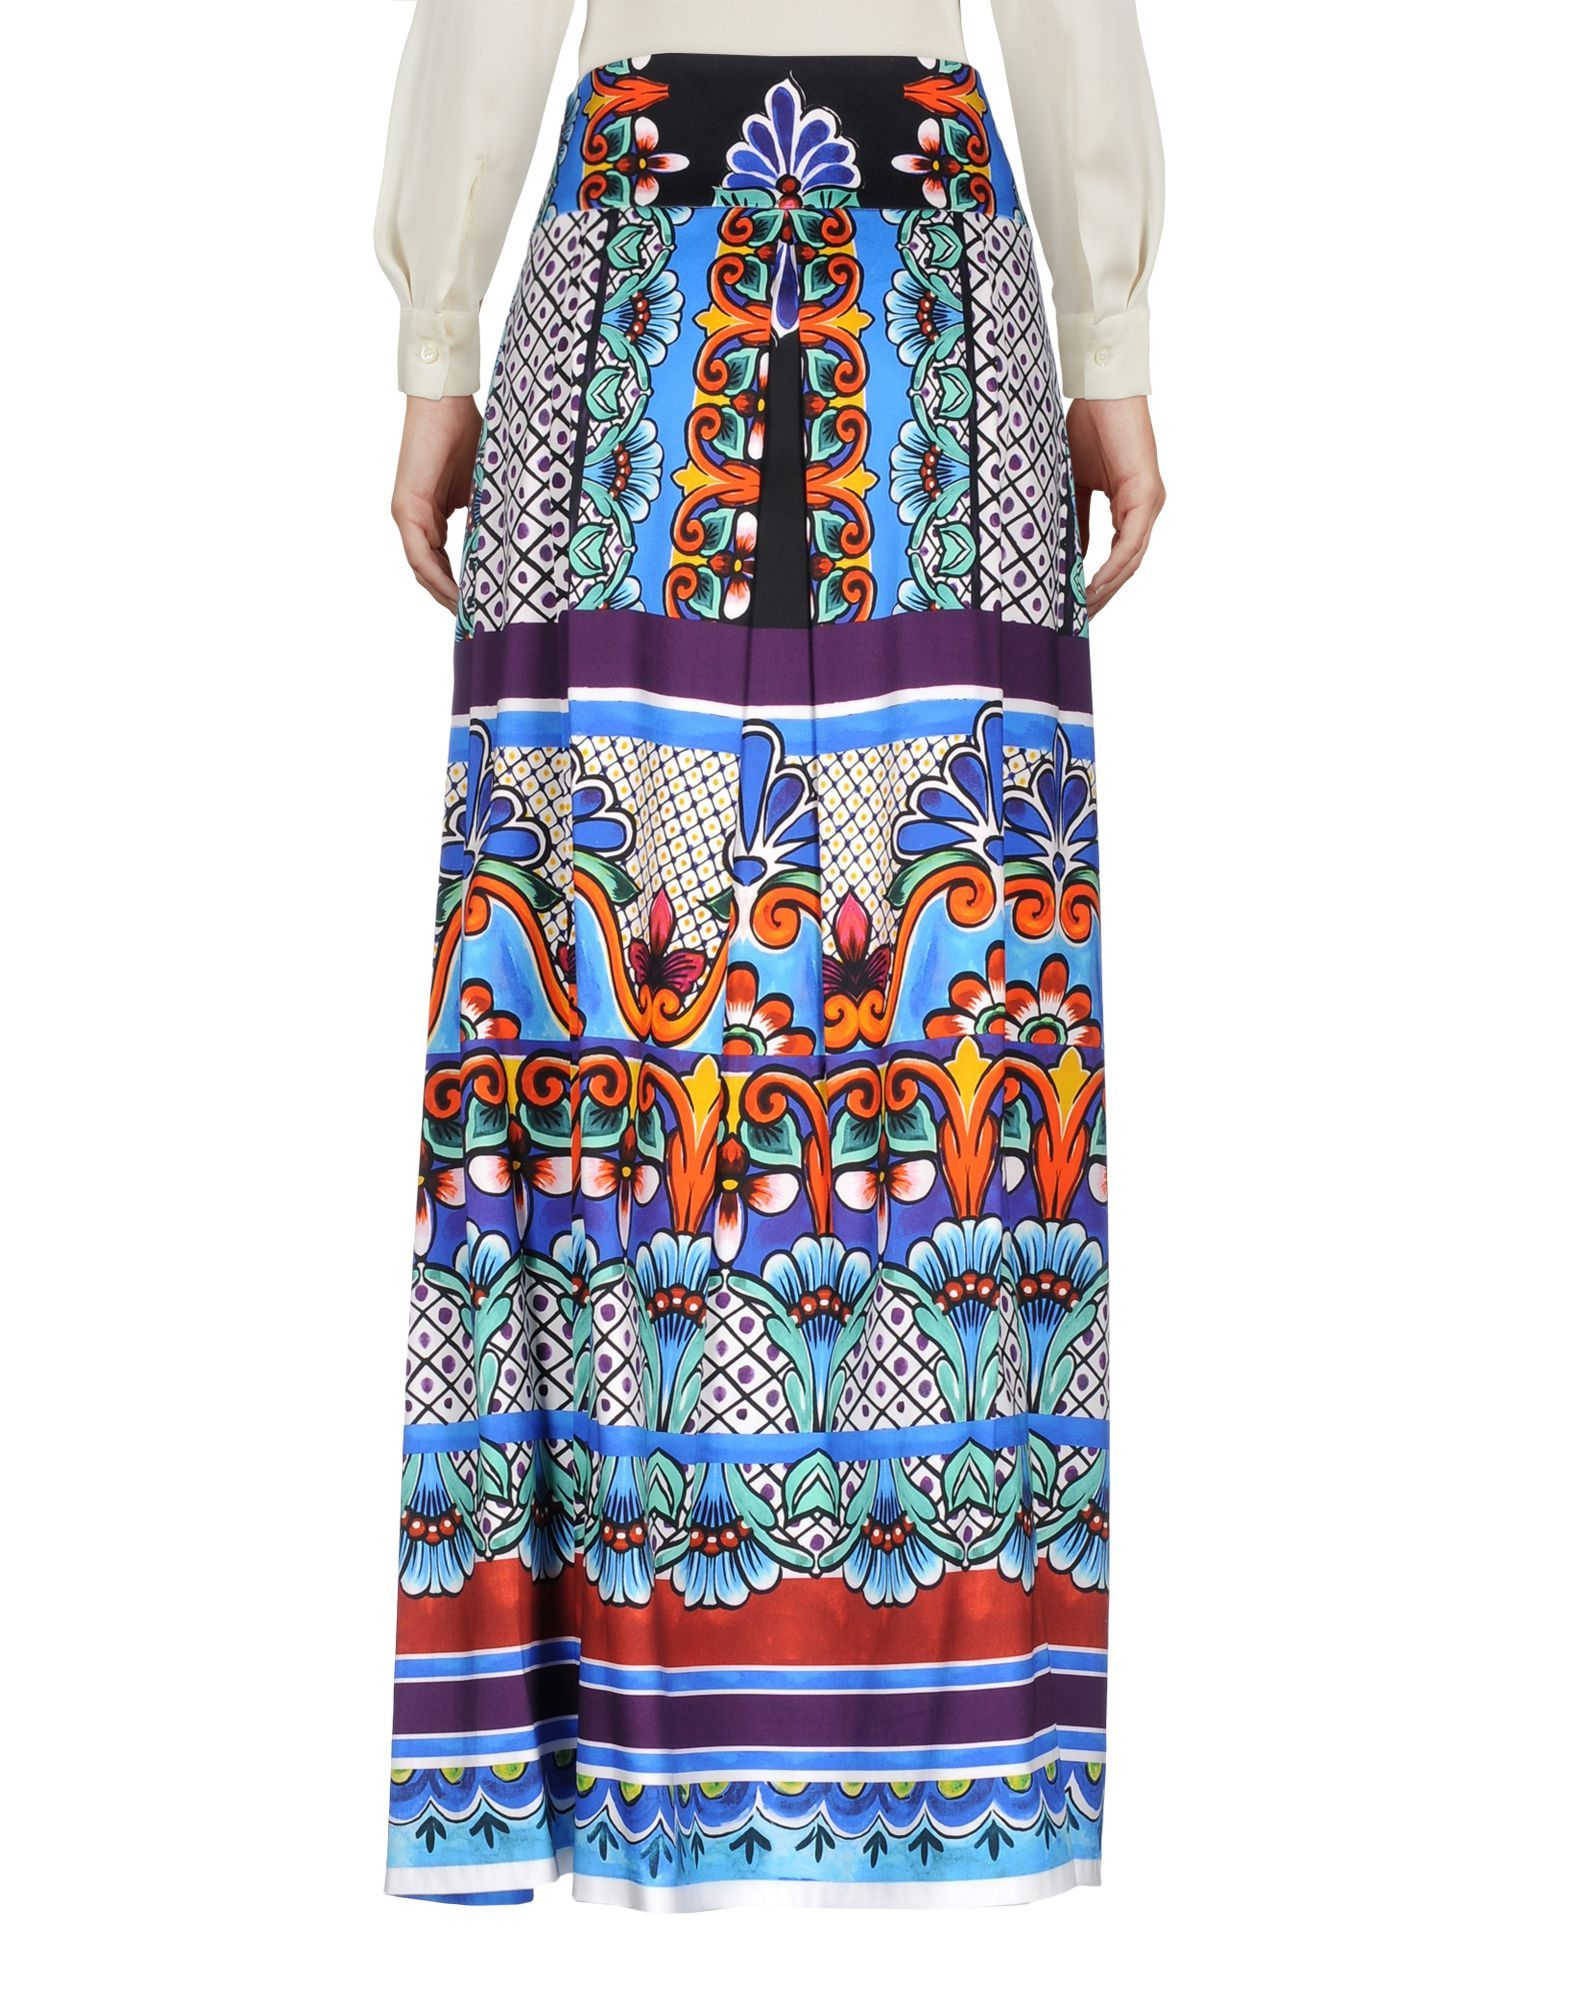 Alberta Ferretti Blue Print Cotton Full Length Skirt